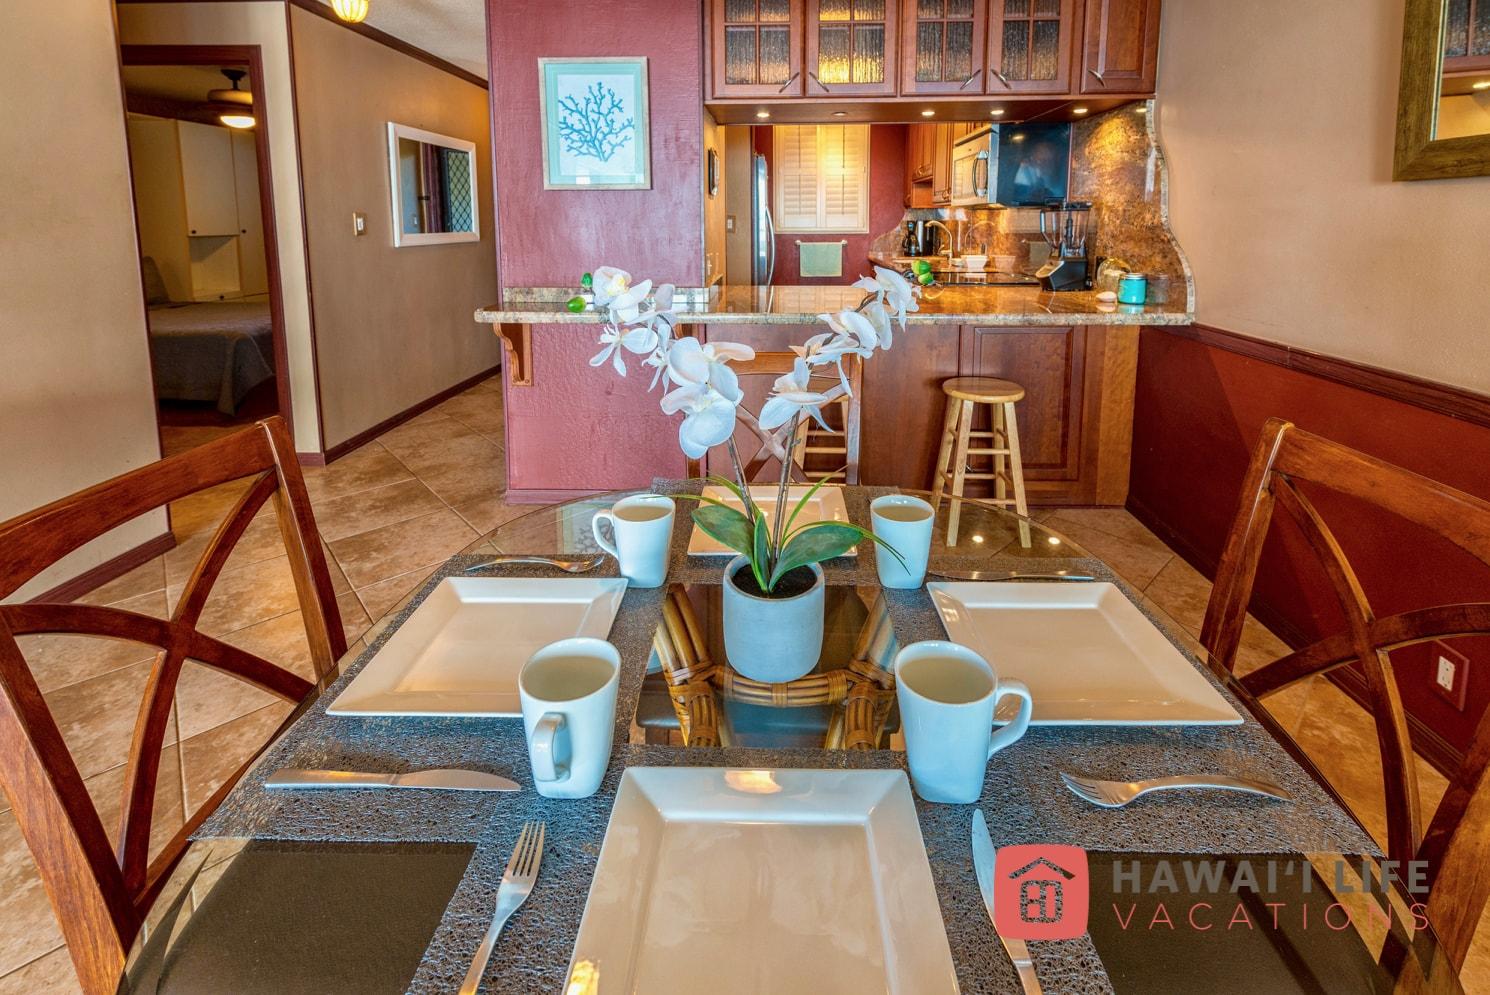 Kanai A Nalu Maui Vacation Rental - Kitchen and Dining Room